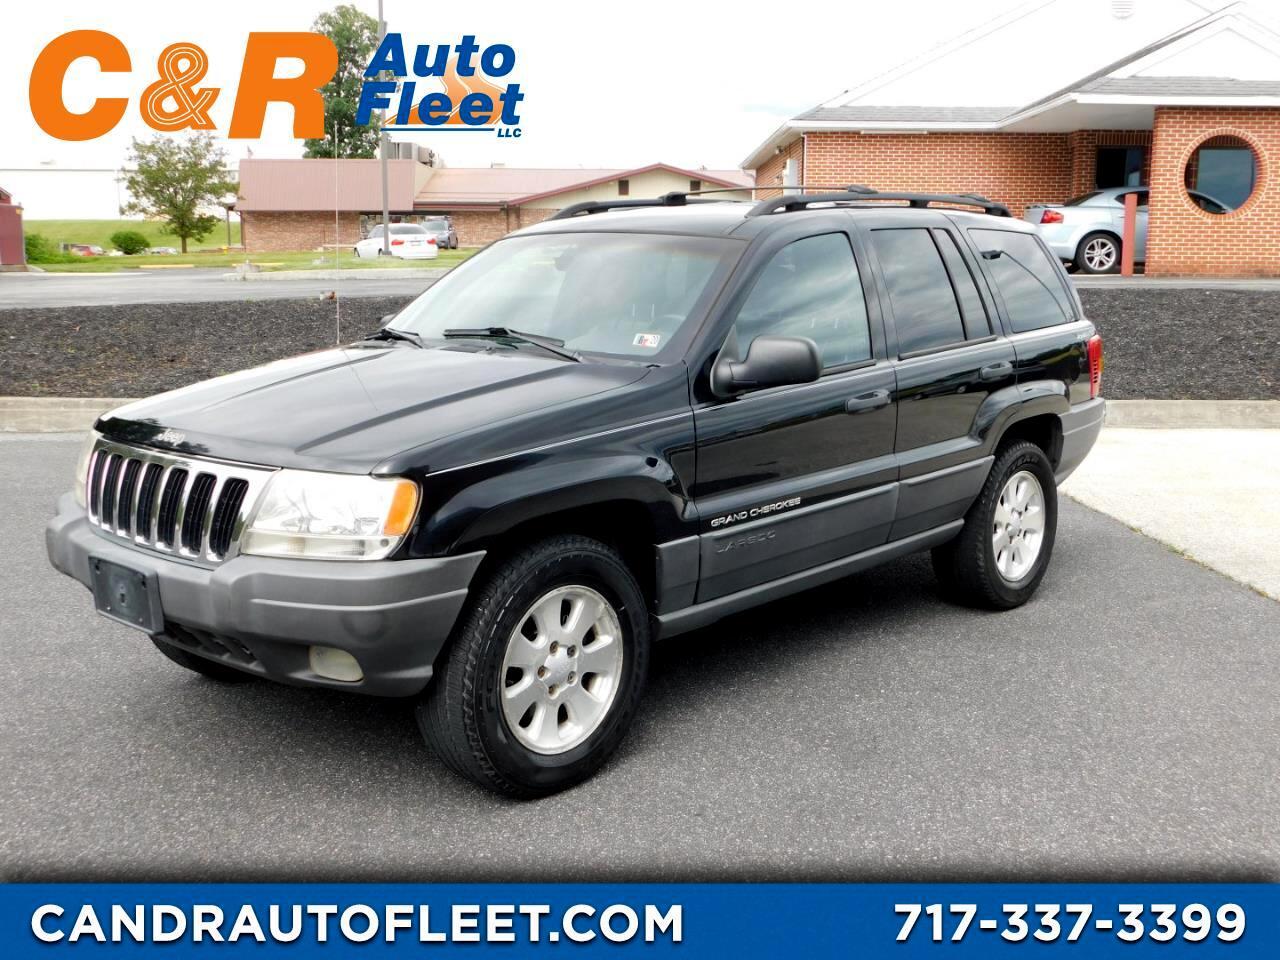 2001 Jeep Grand Cherokee 4dr Laredo 4WD